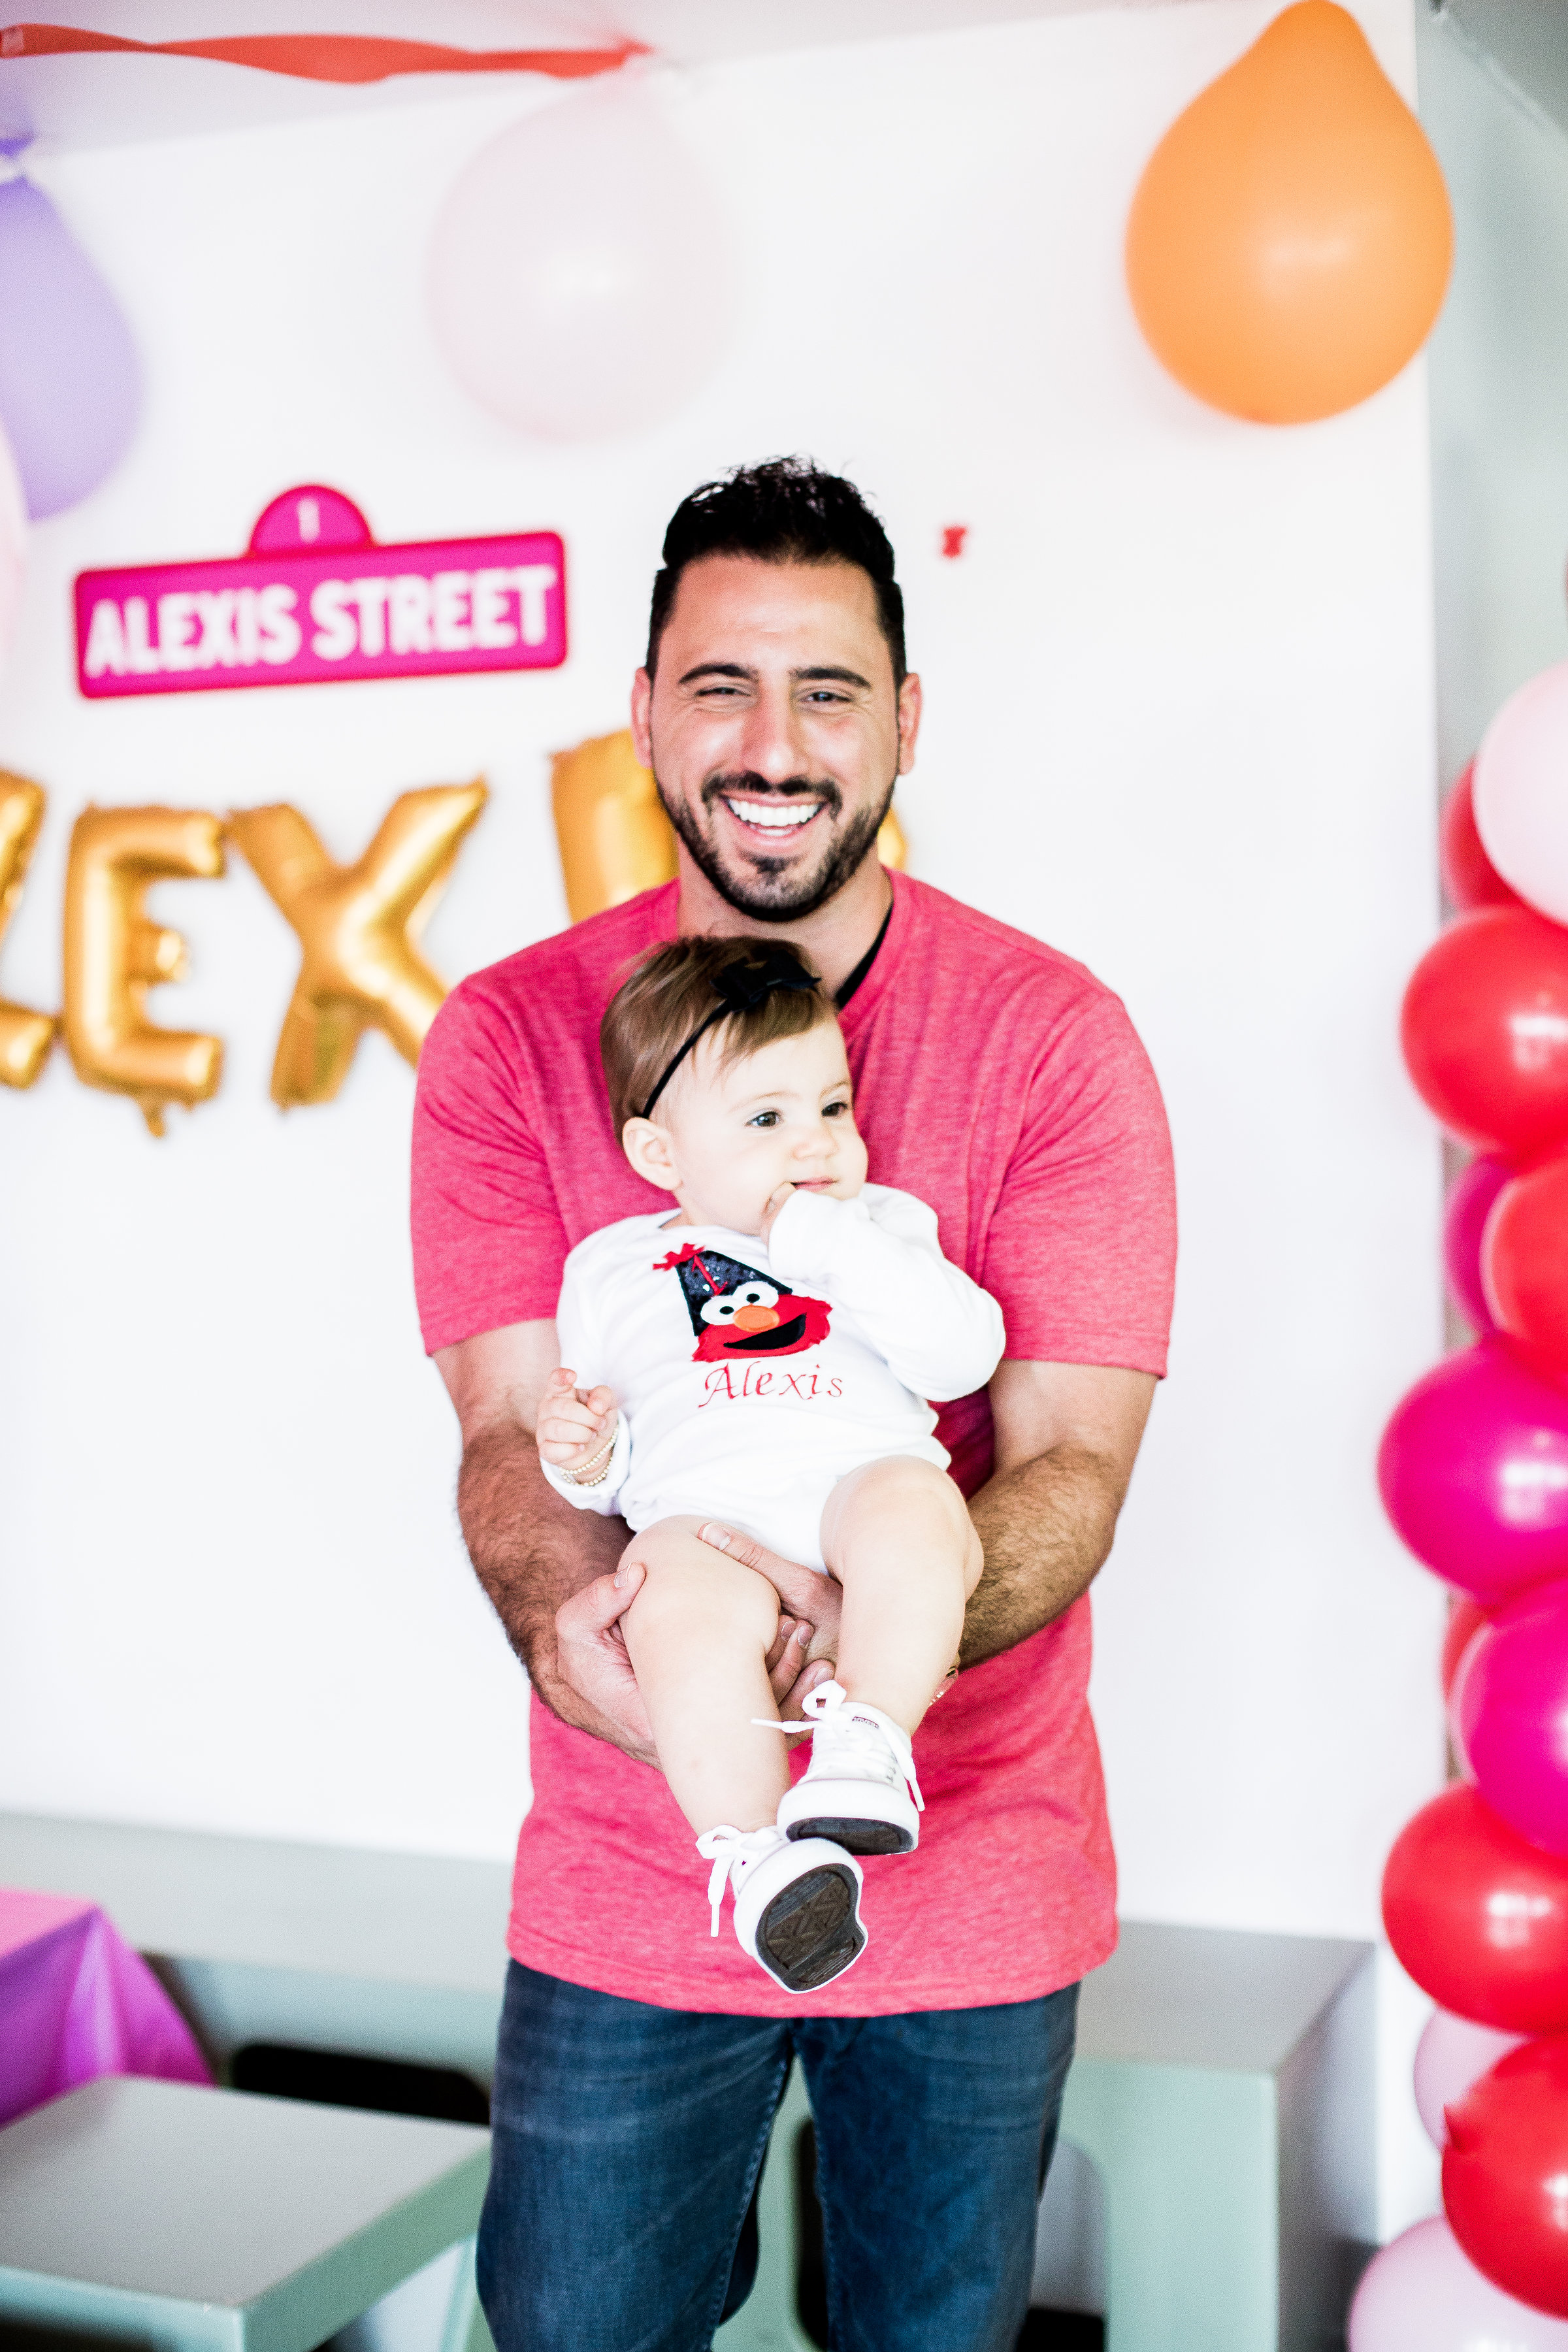 Alexis'_1st_Birthday_04.07.18_-71.jpg